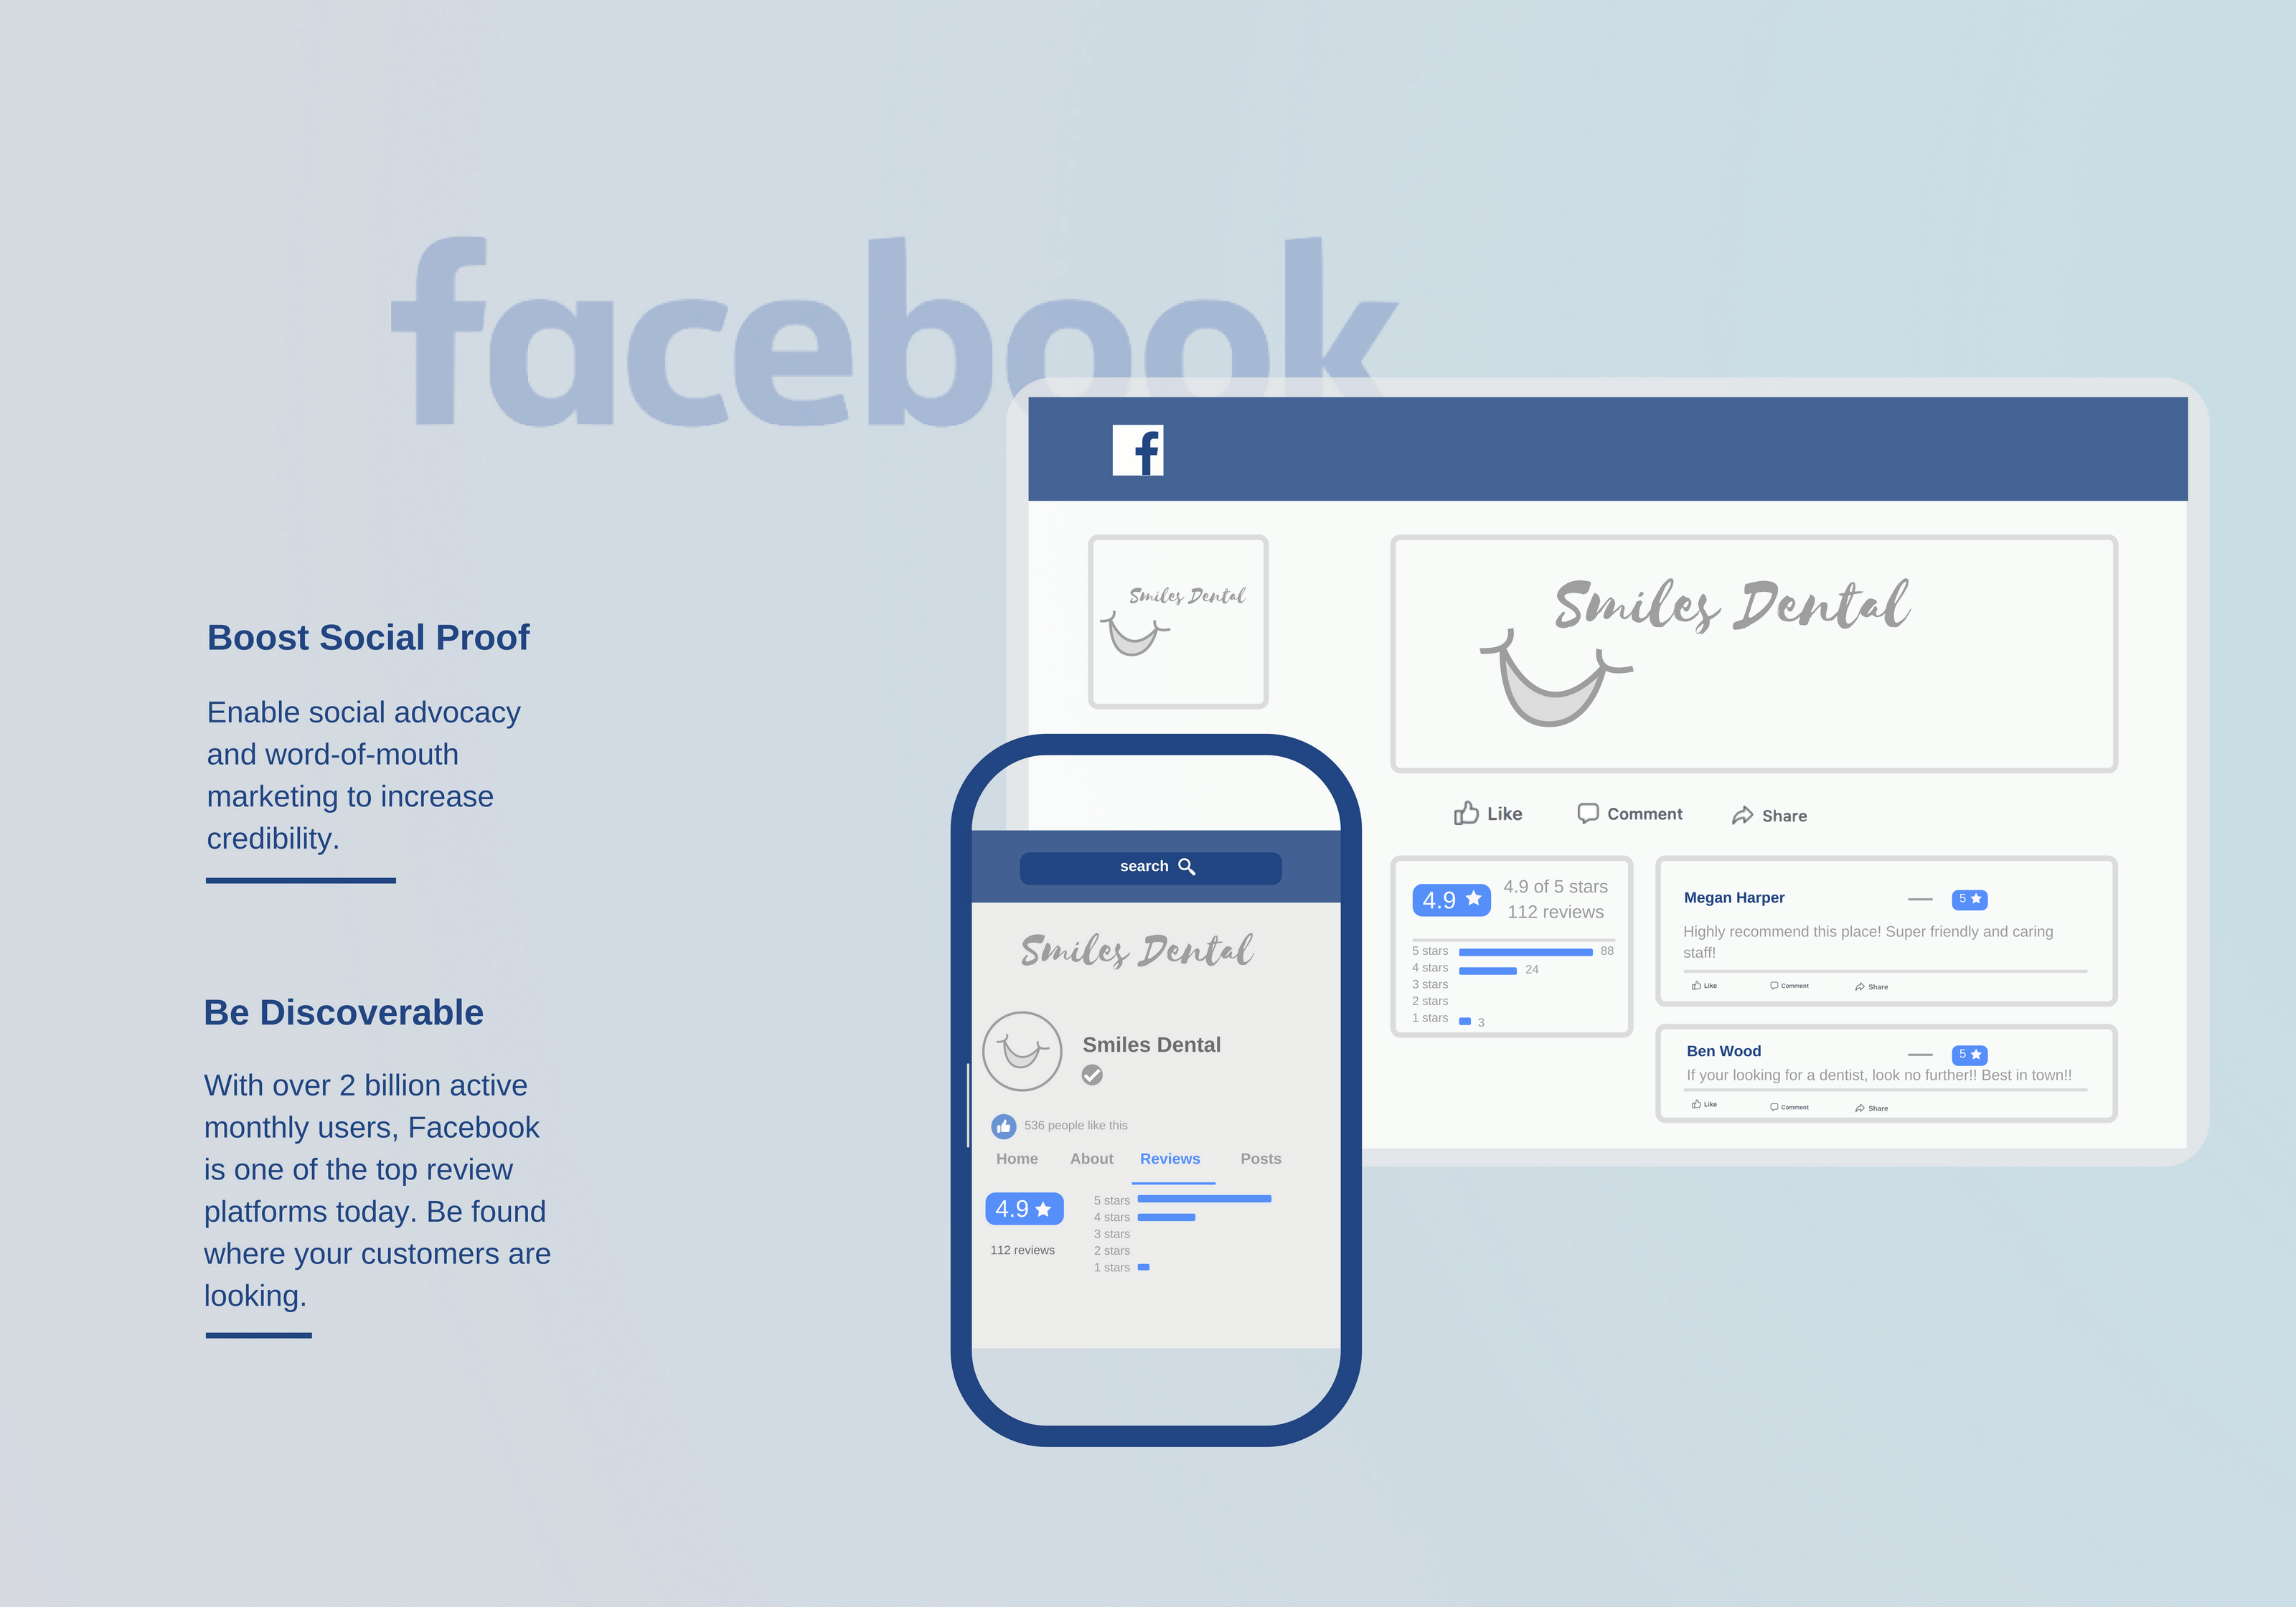 Facebook reviews build social proof